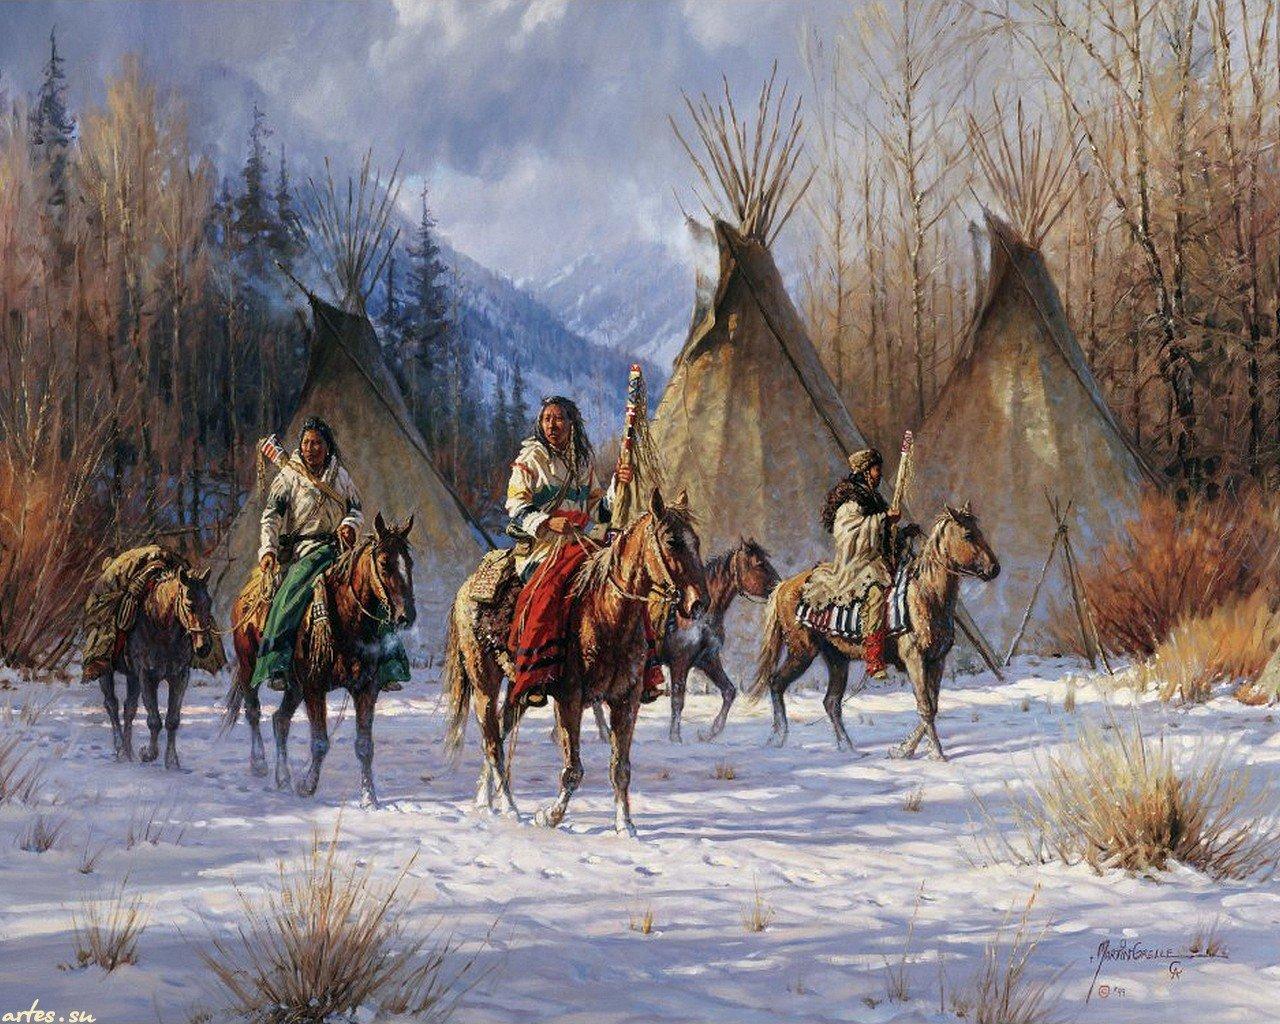 Native American Wallpapers 1280x1024 Desktop Backgrounds